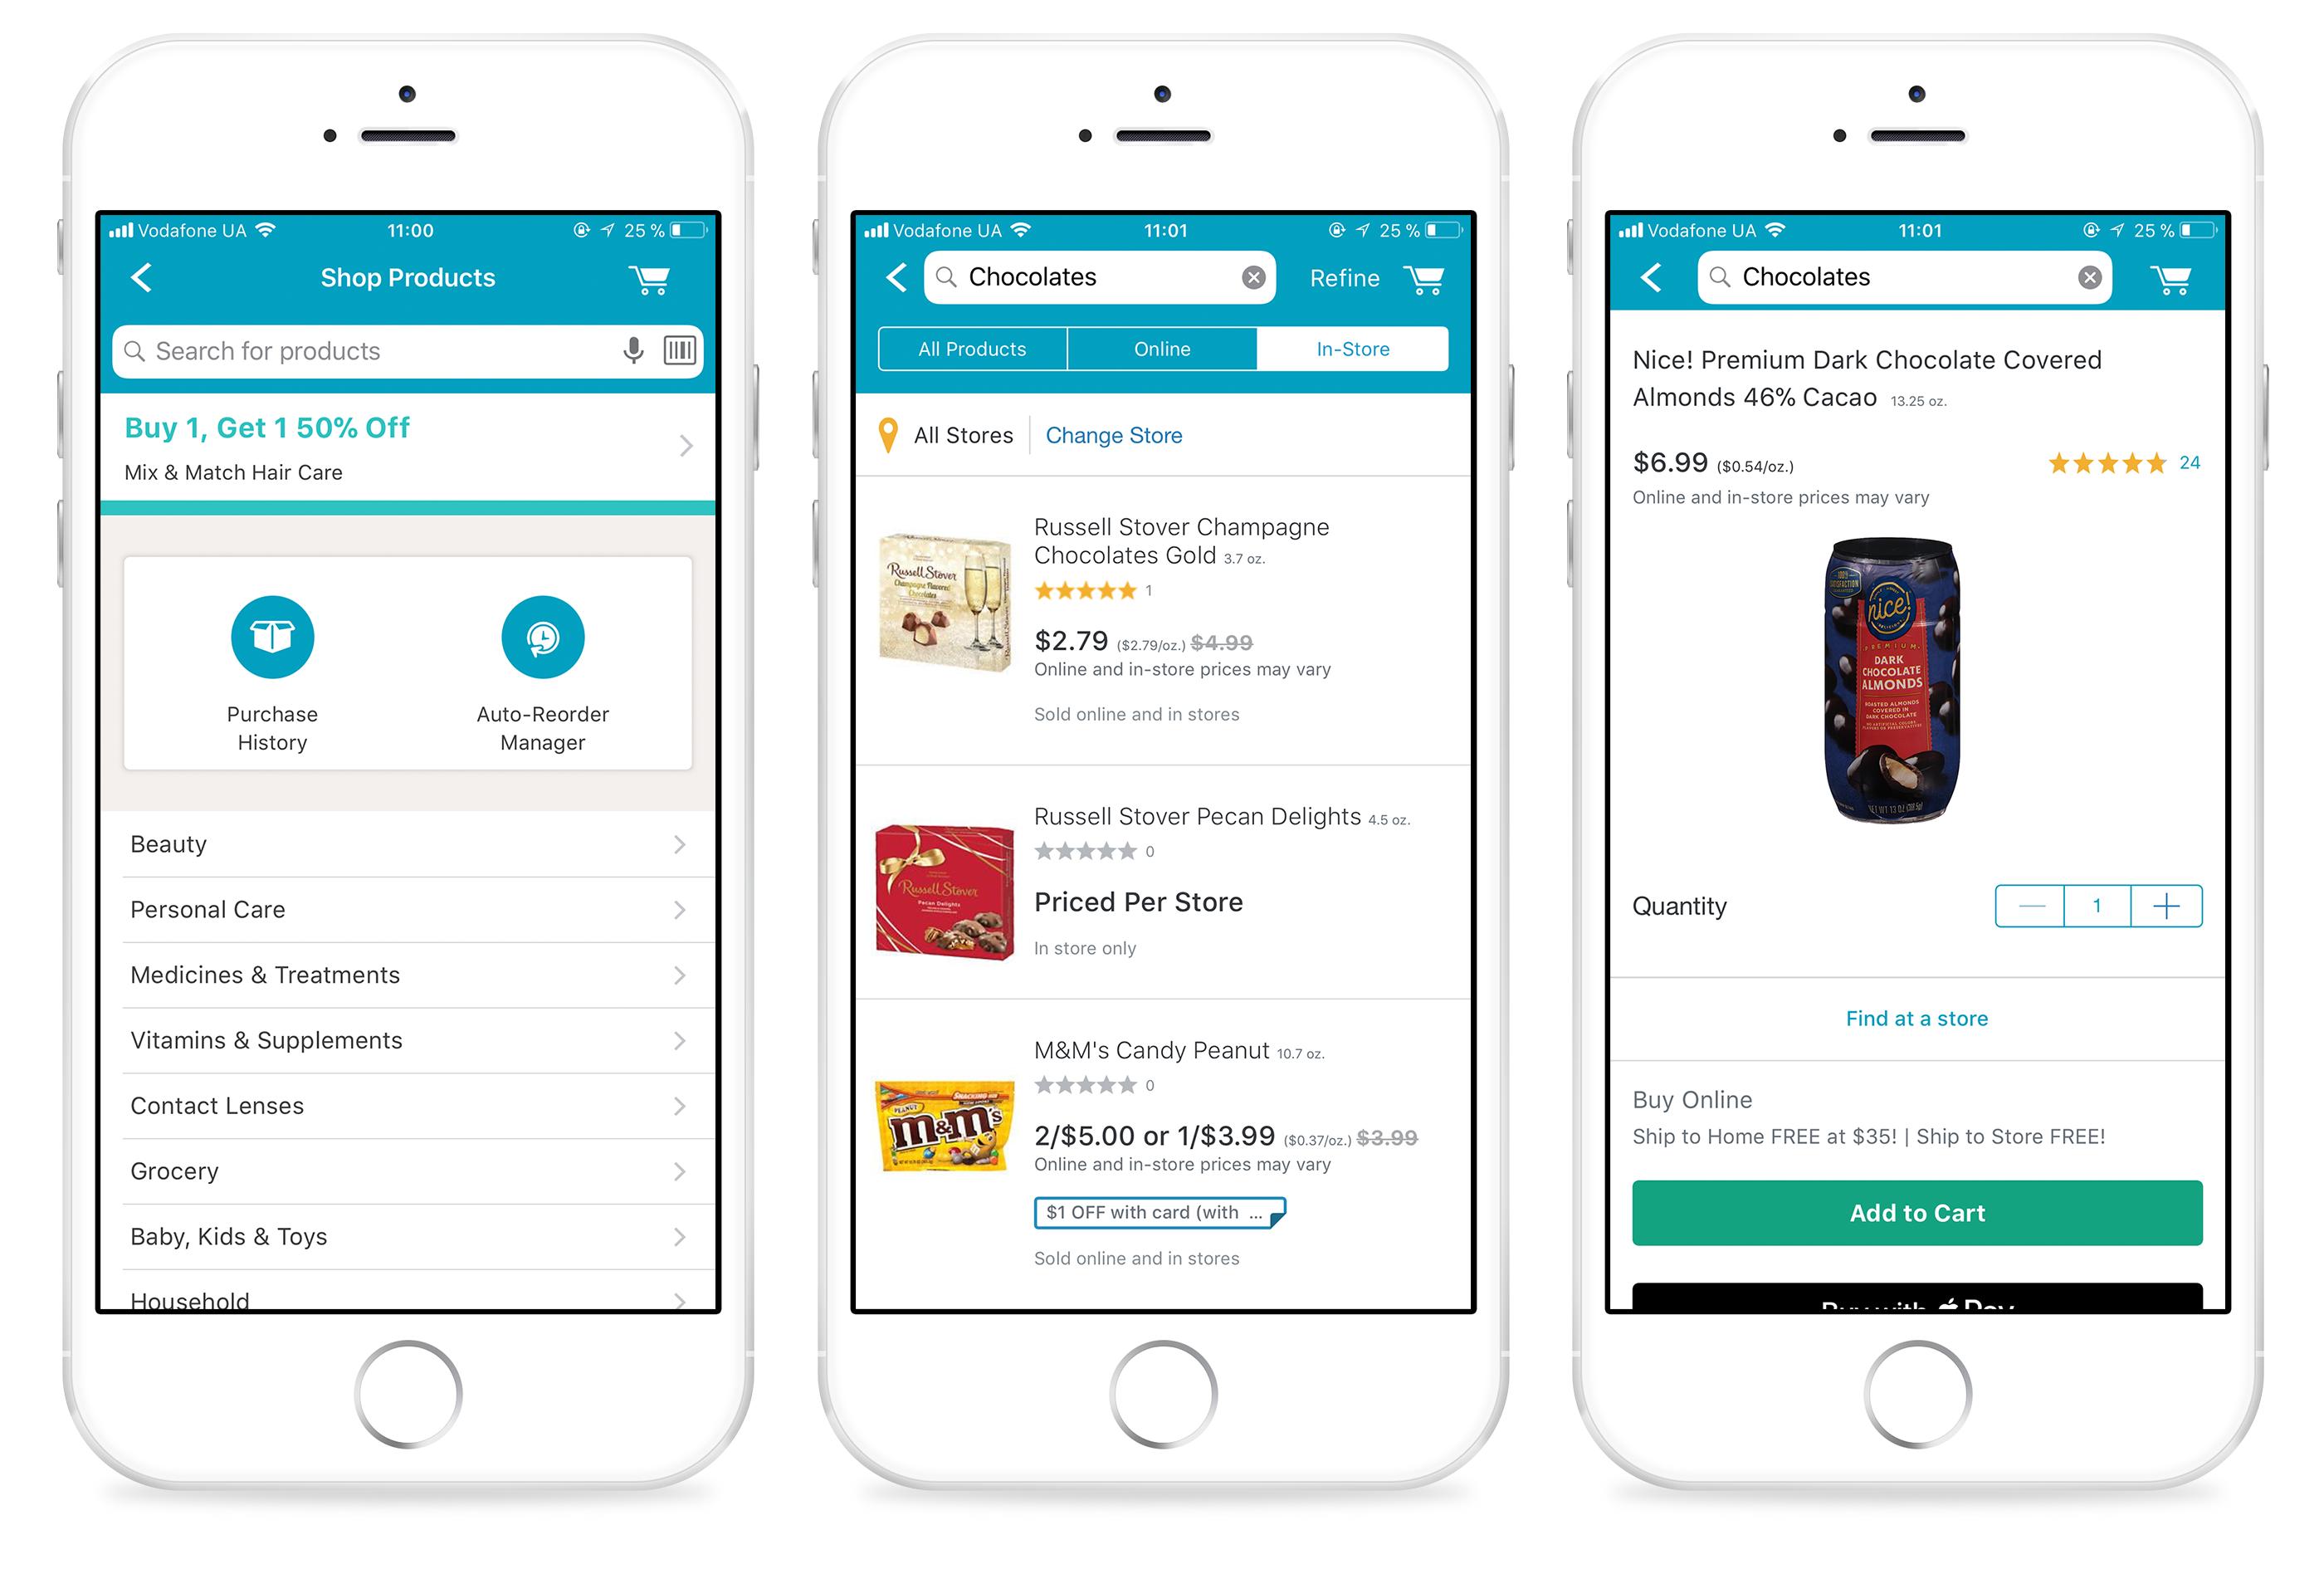 Supermarket-specific app